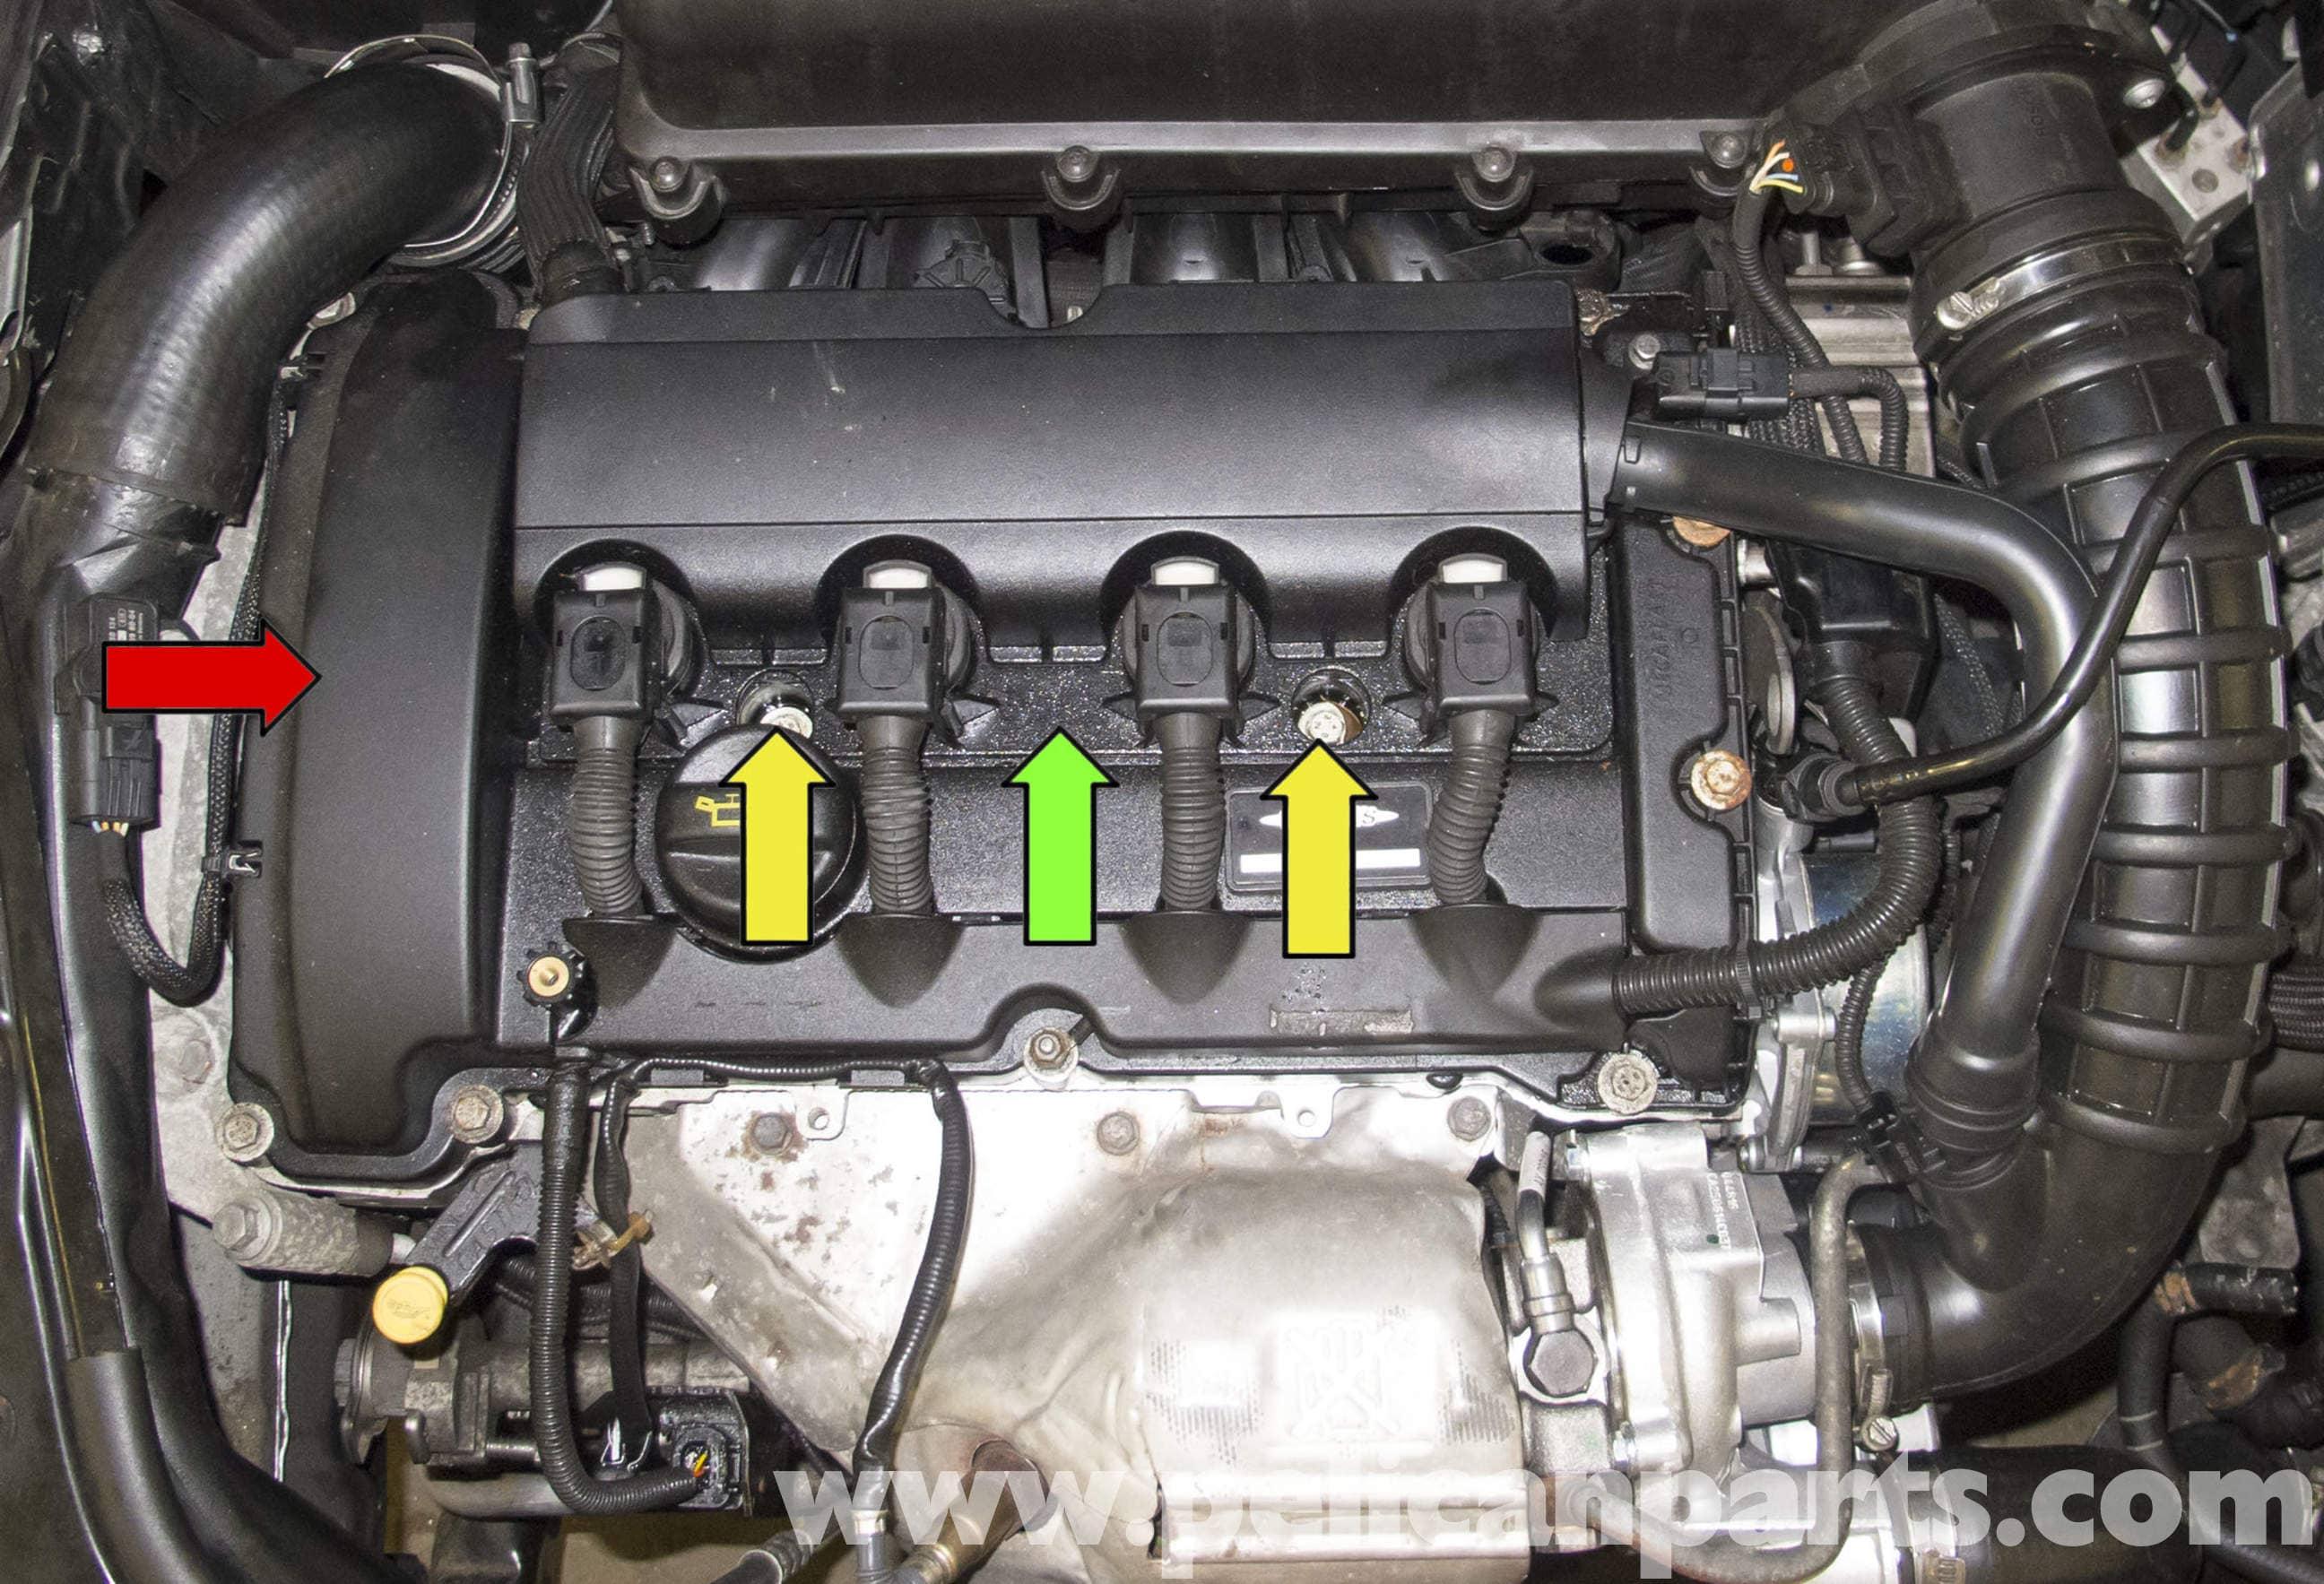 Ford 1600 Starter Wiring Diagram Mini Cooper R56 Oil Leak Diagnosis 2007 2011 Pelican